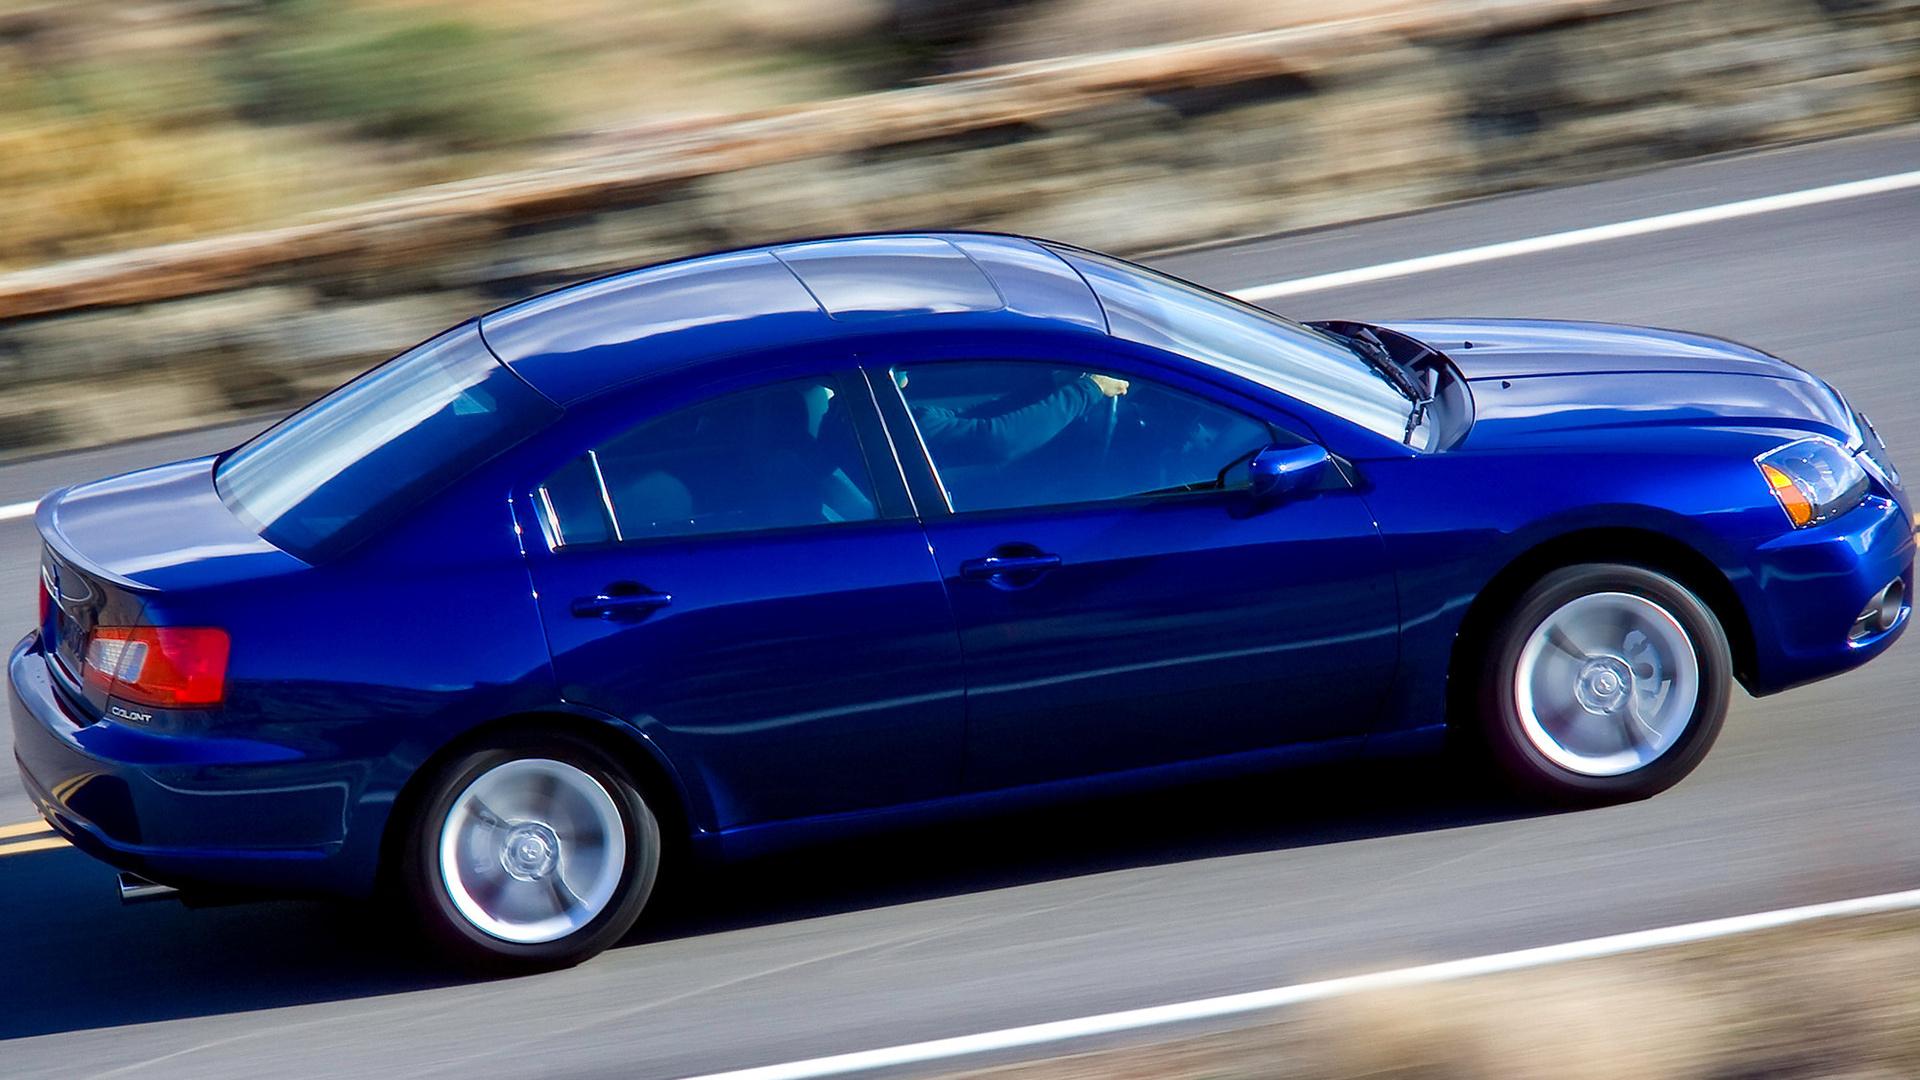 2008 Mitsubishi Galant Wallpapers And Hd Images Car Pixel